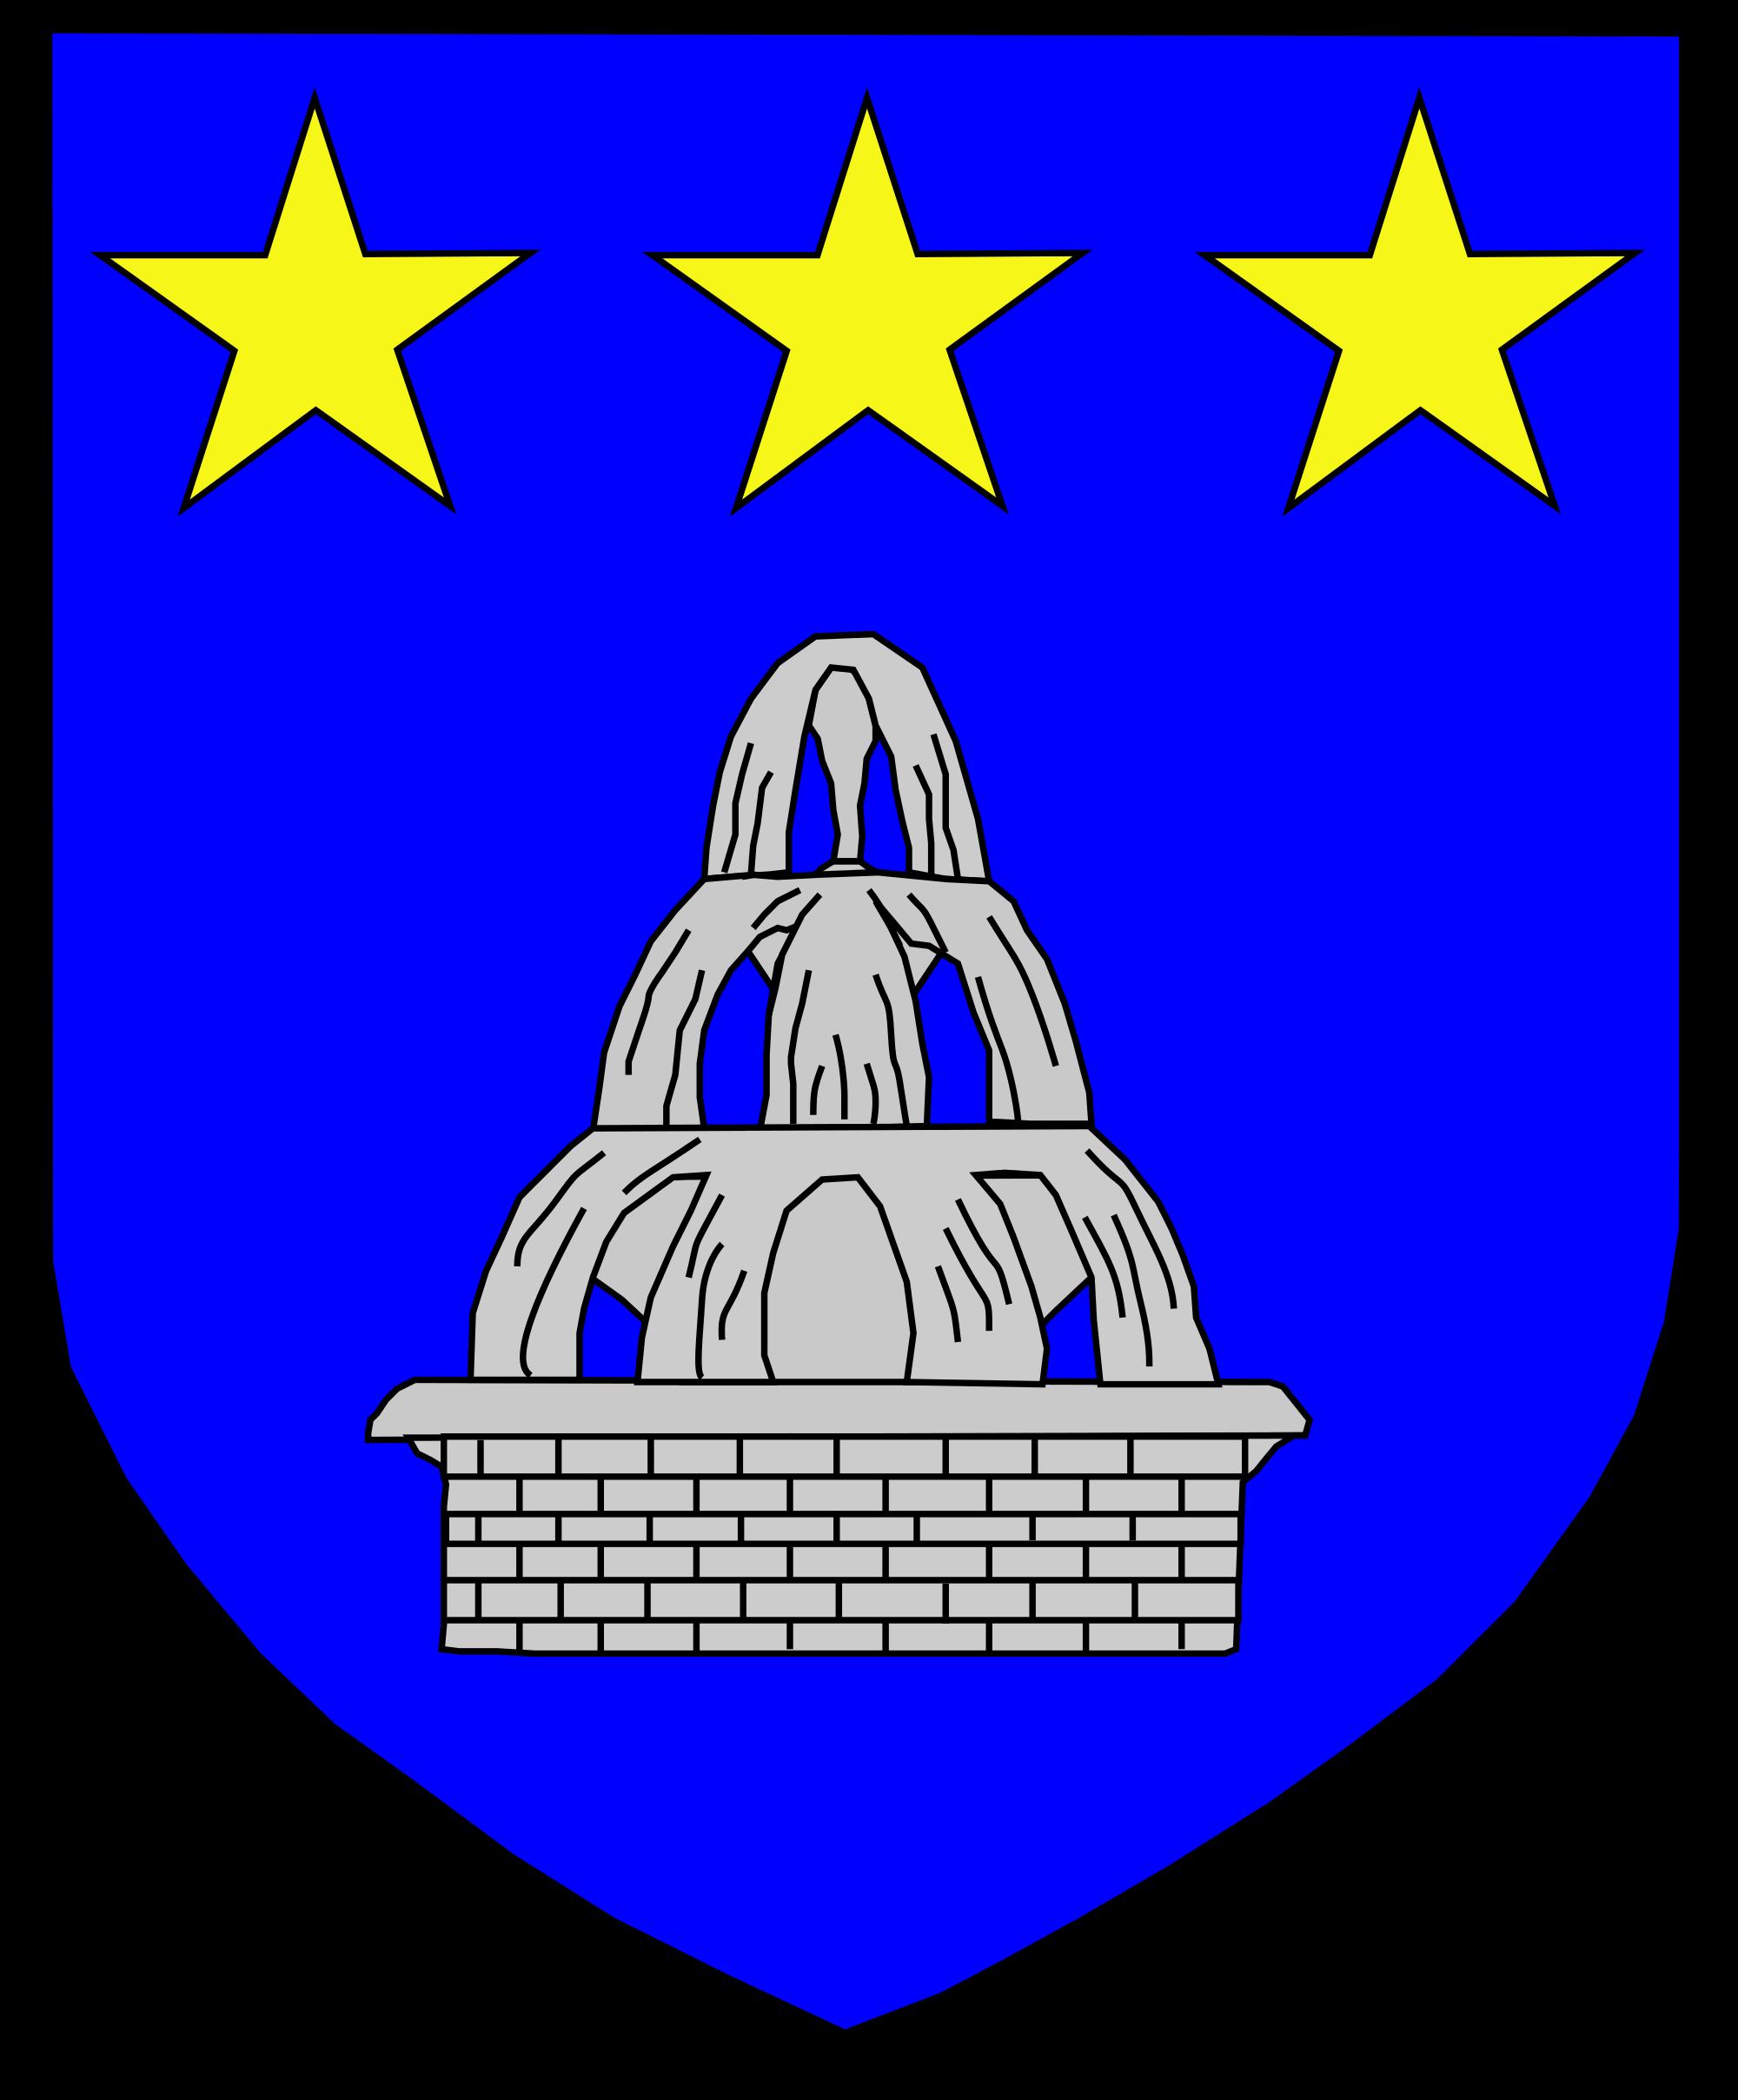 File:Blason ville fr clairefontaine (Yvelines).svg.